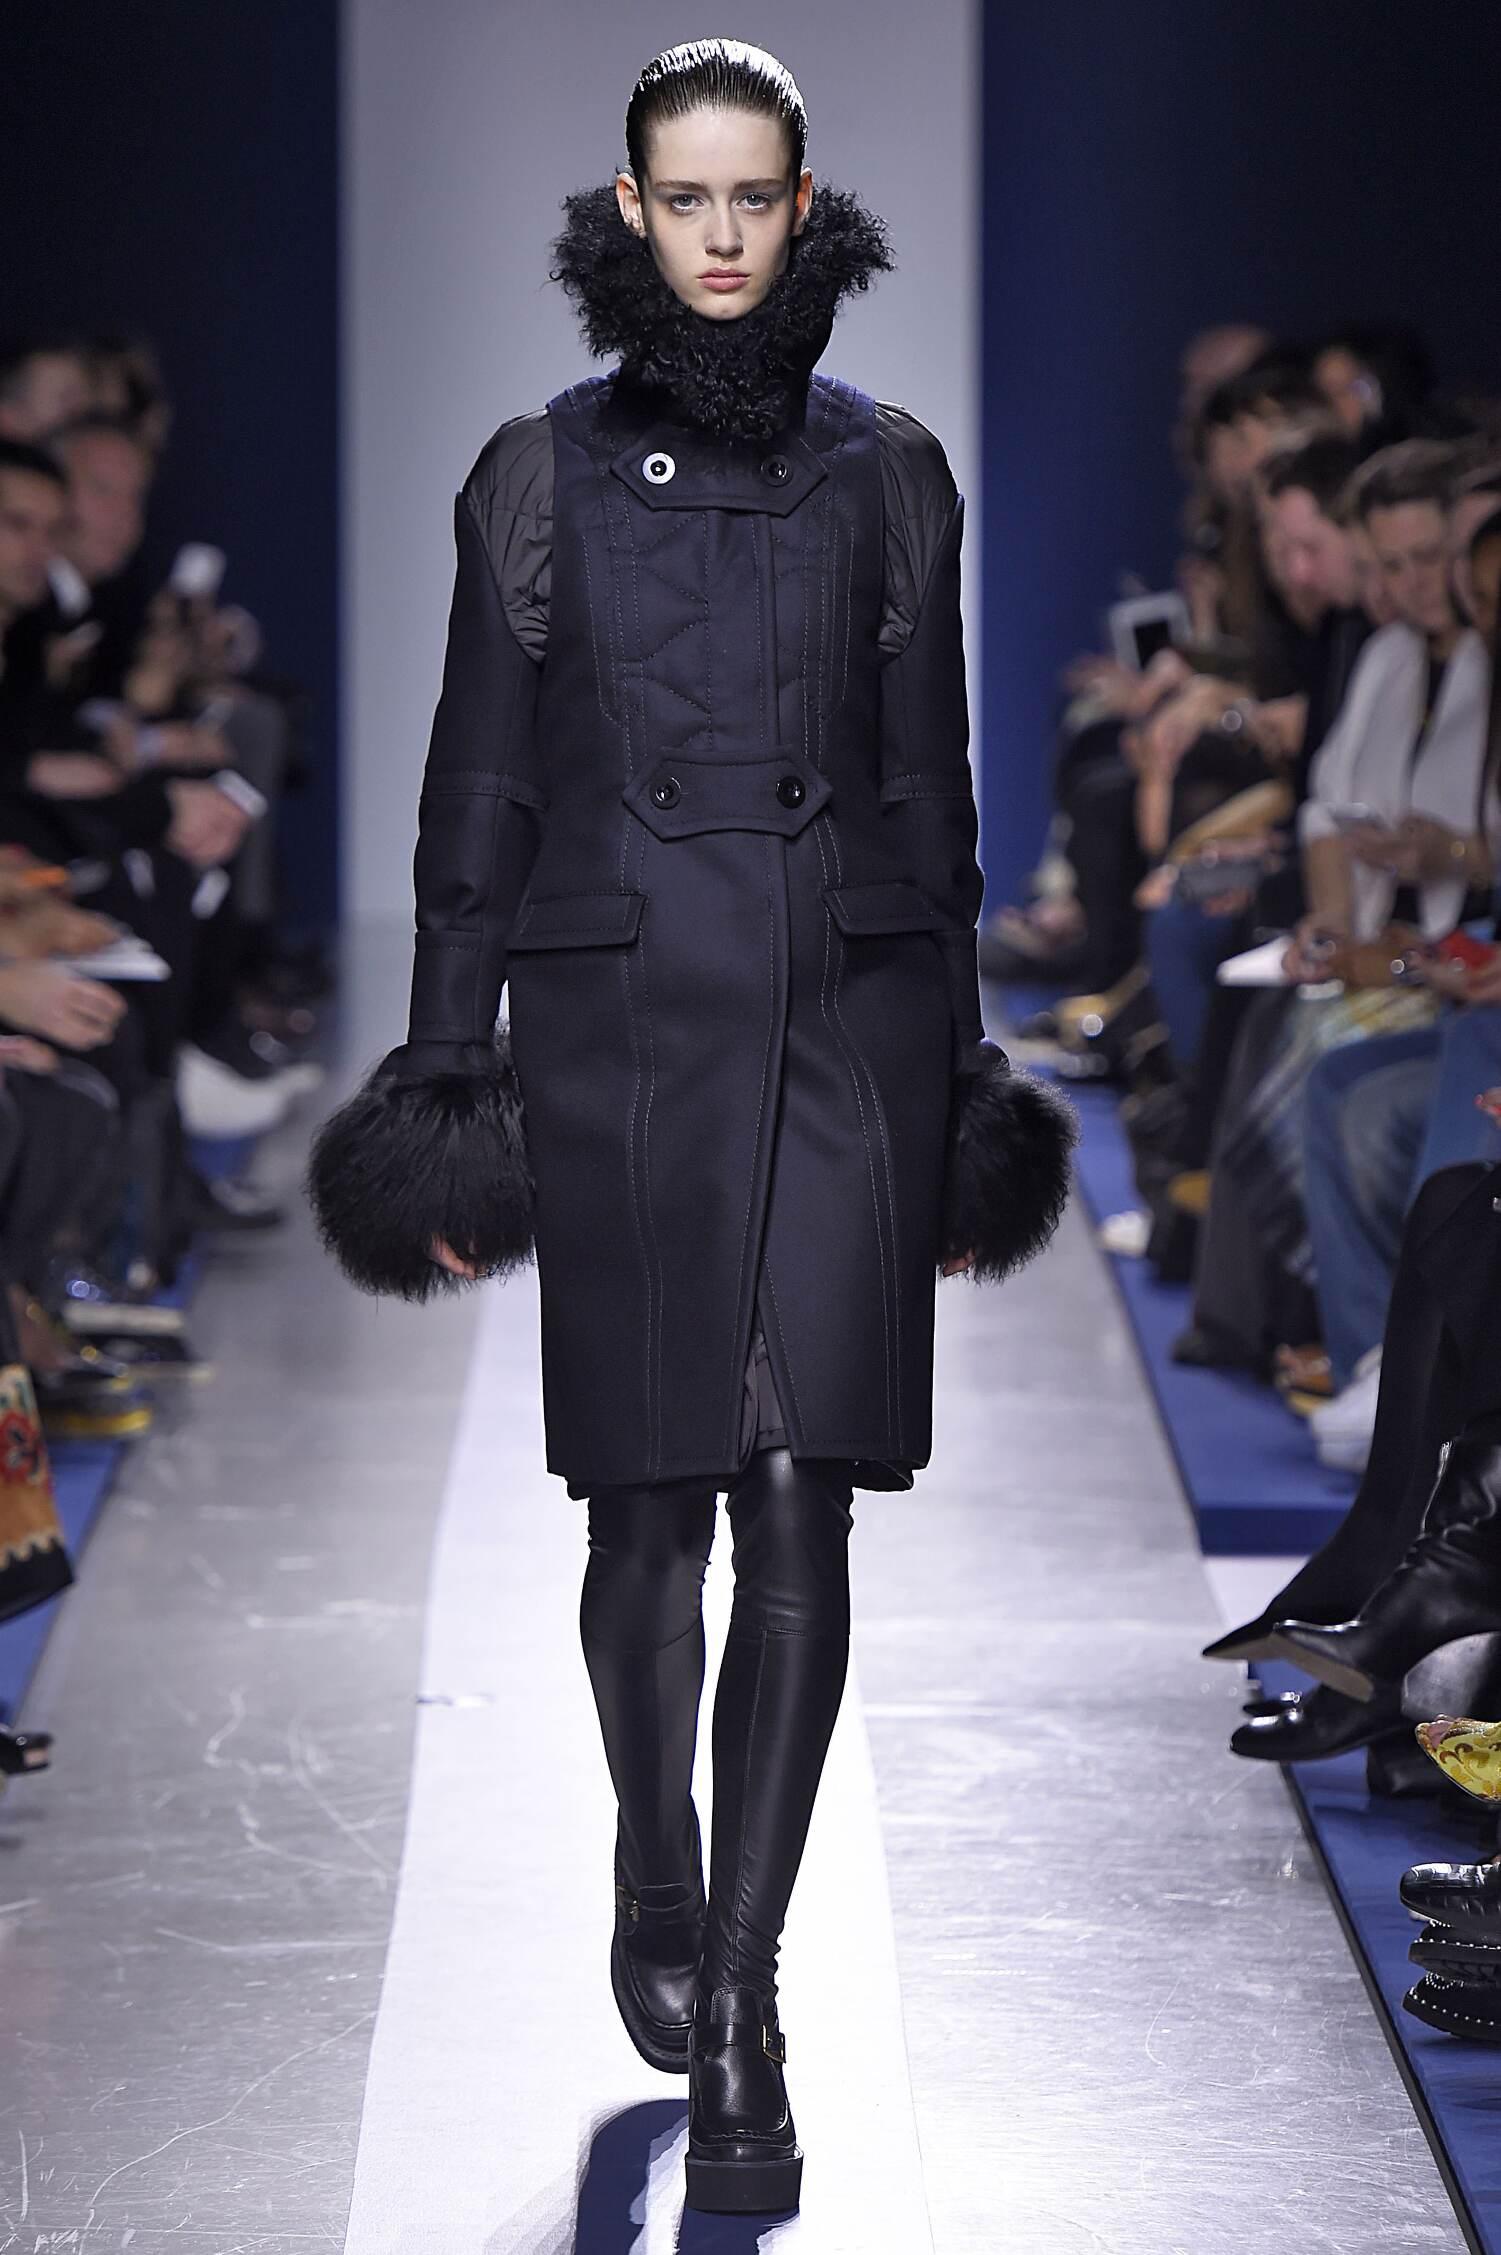 Winter 2015 Fashion Show Sacai Collection